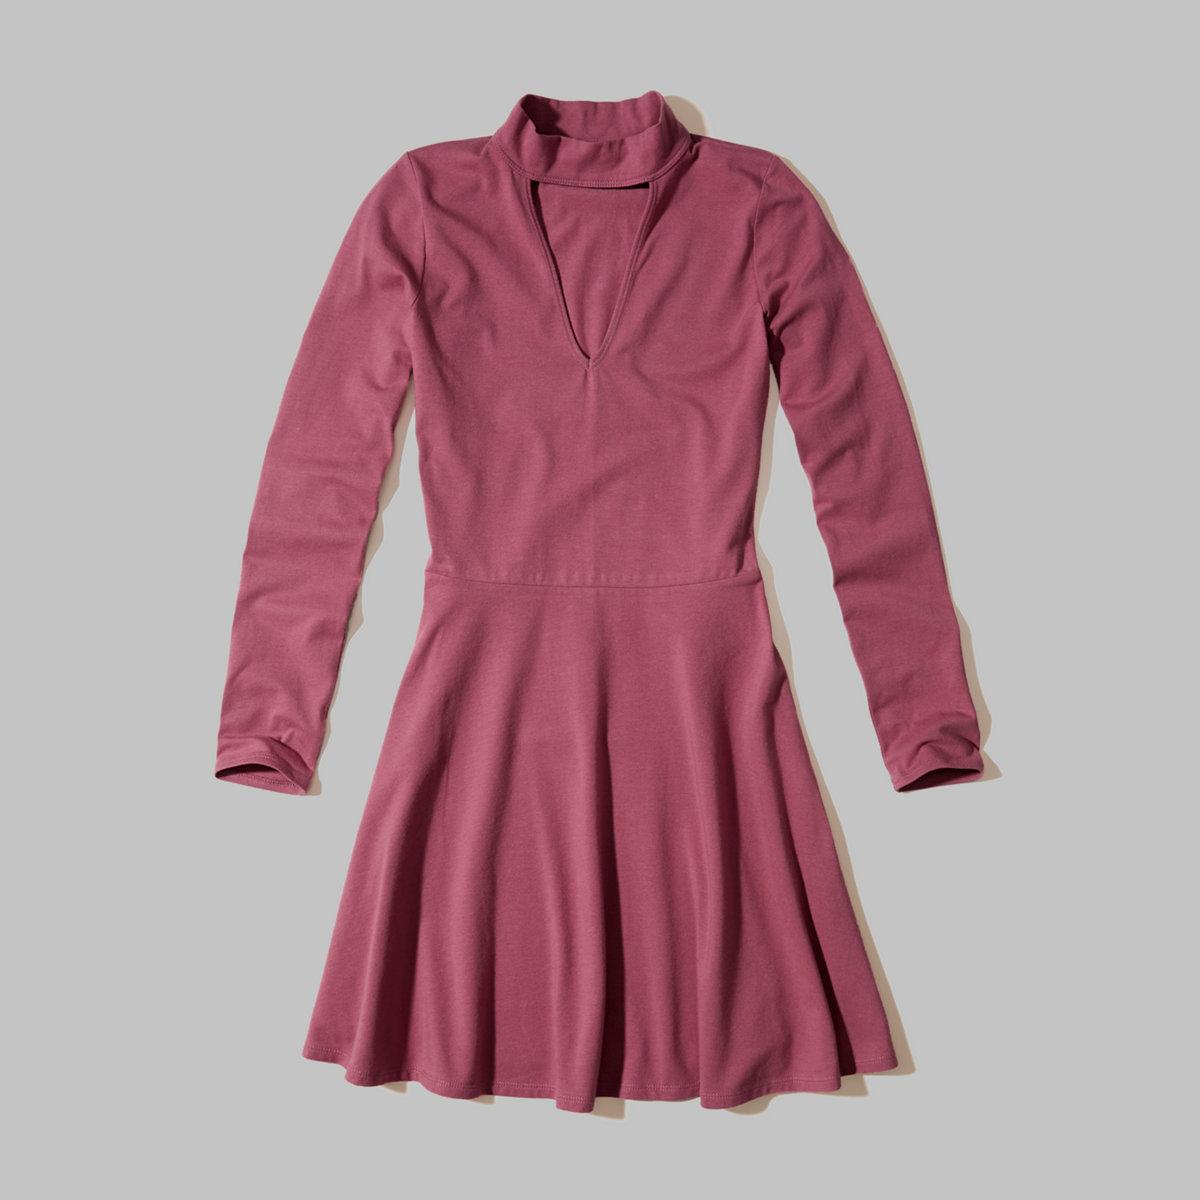 Knit Skater Choker Dress